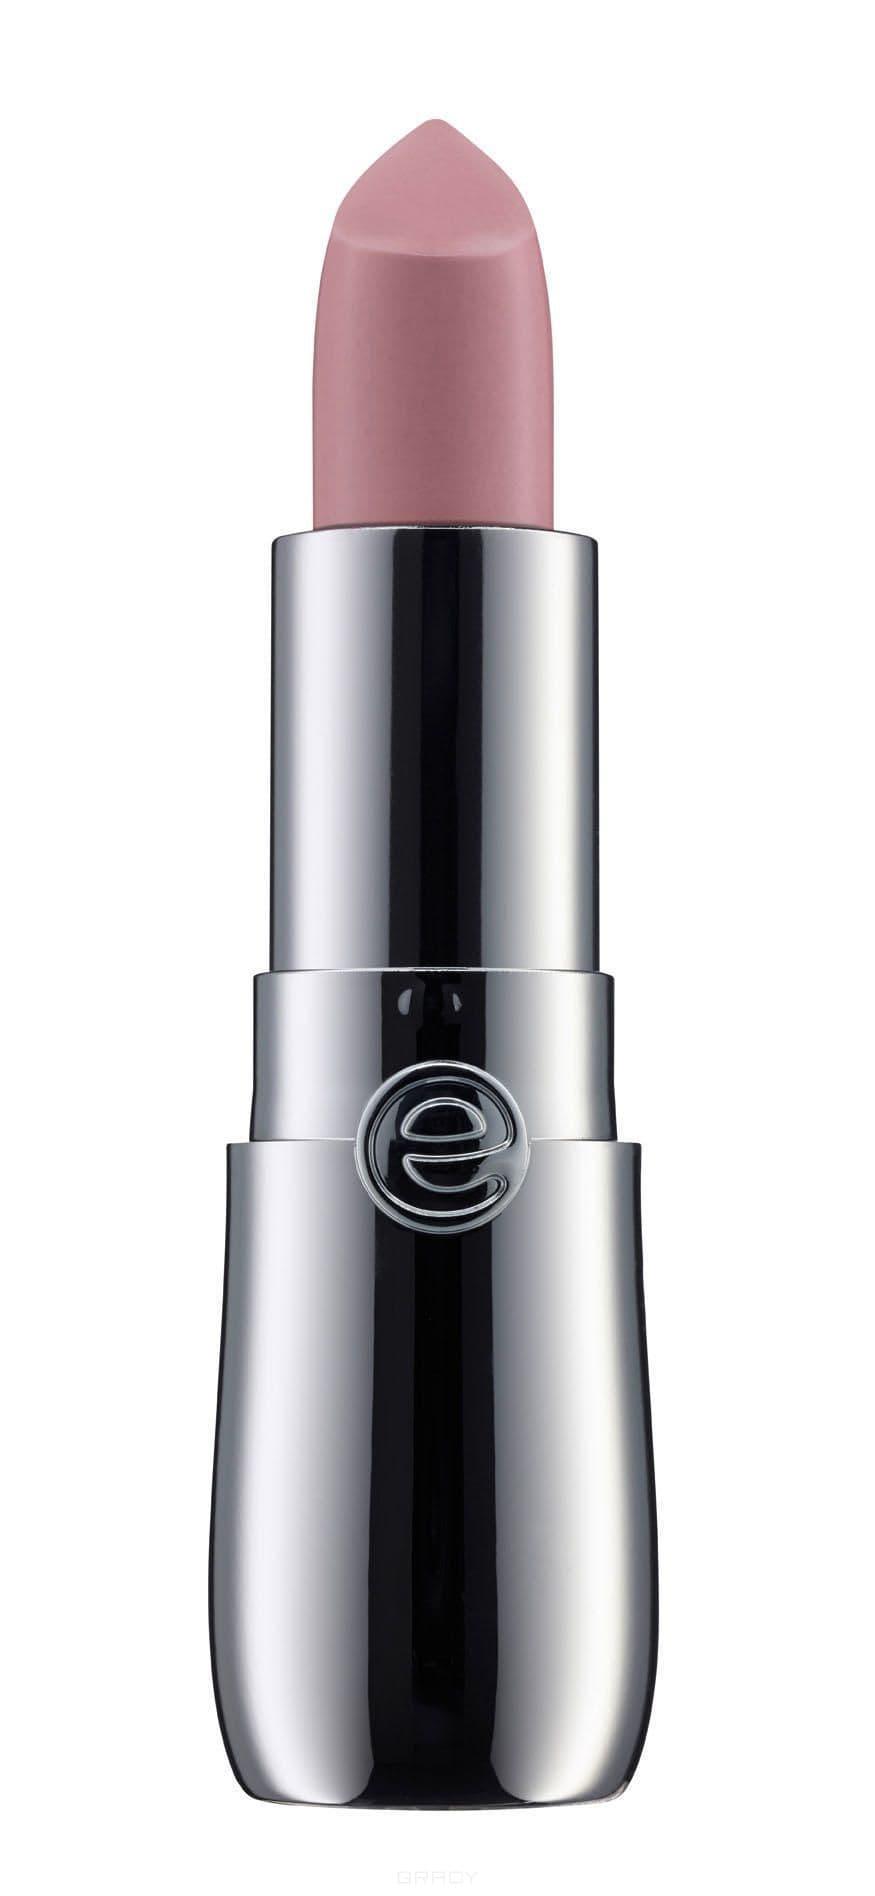 все цены на Essence, Сияющая губная помада Colour Up! Shine On! Lipstick, 3.5 гр (12 тонов) №11, крем-брюле онлайн